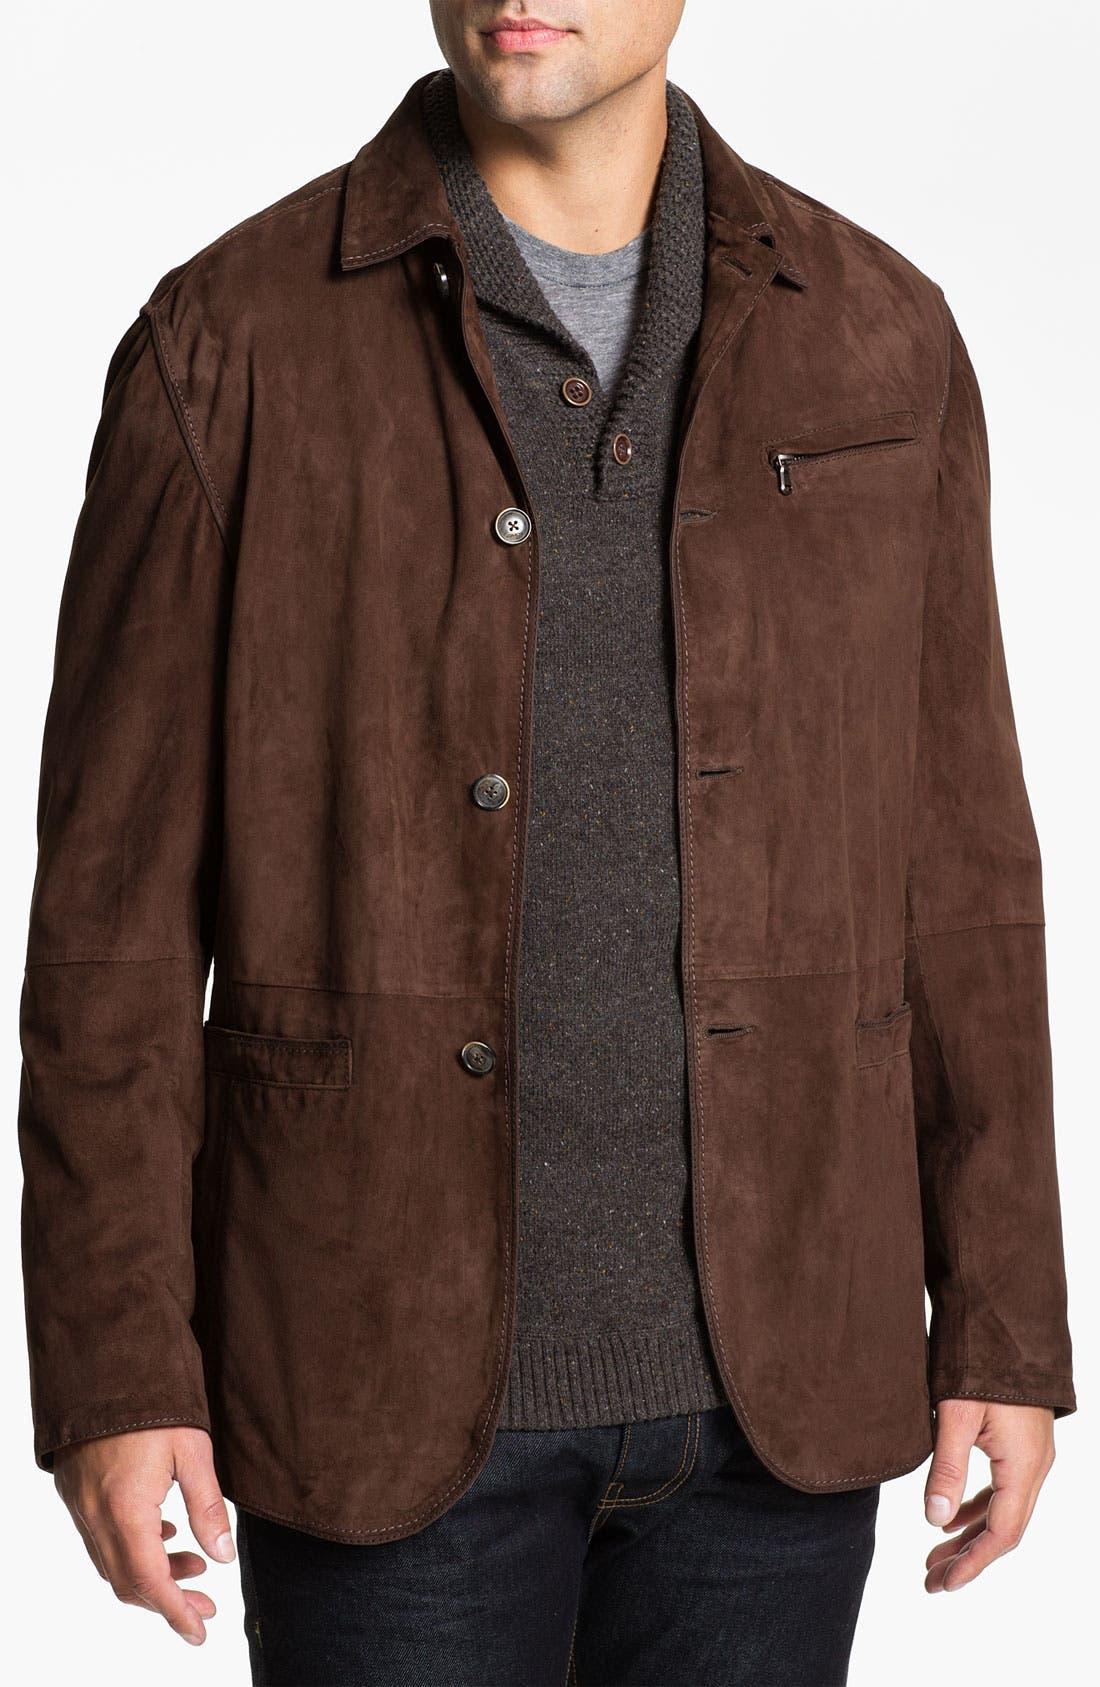 Goatskin Suede Jacket,                             Main thumbnail 1, color,                             200